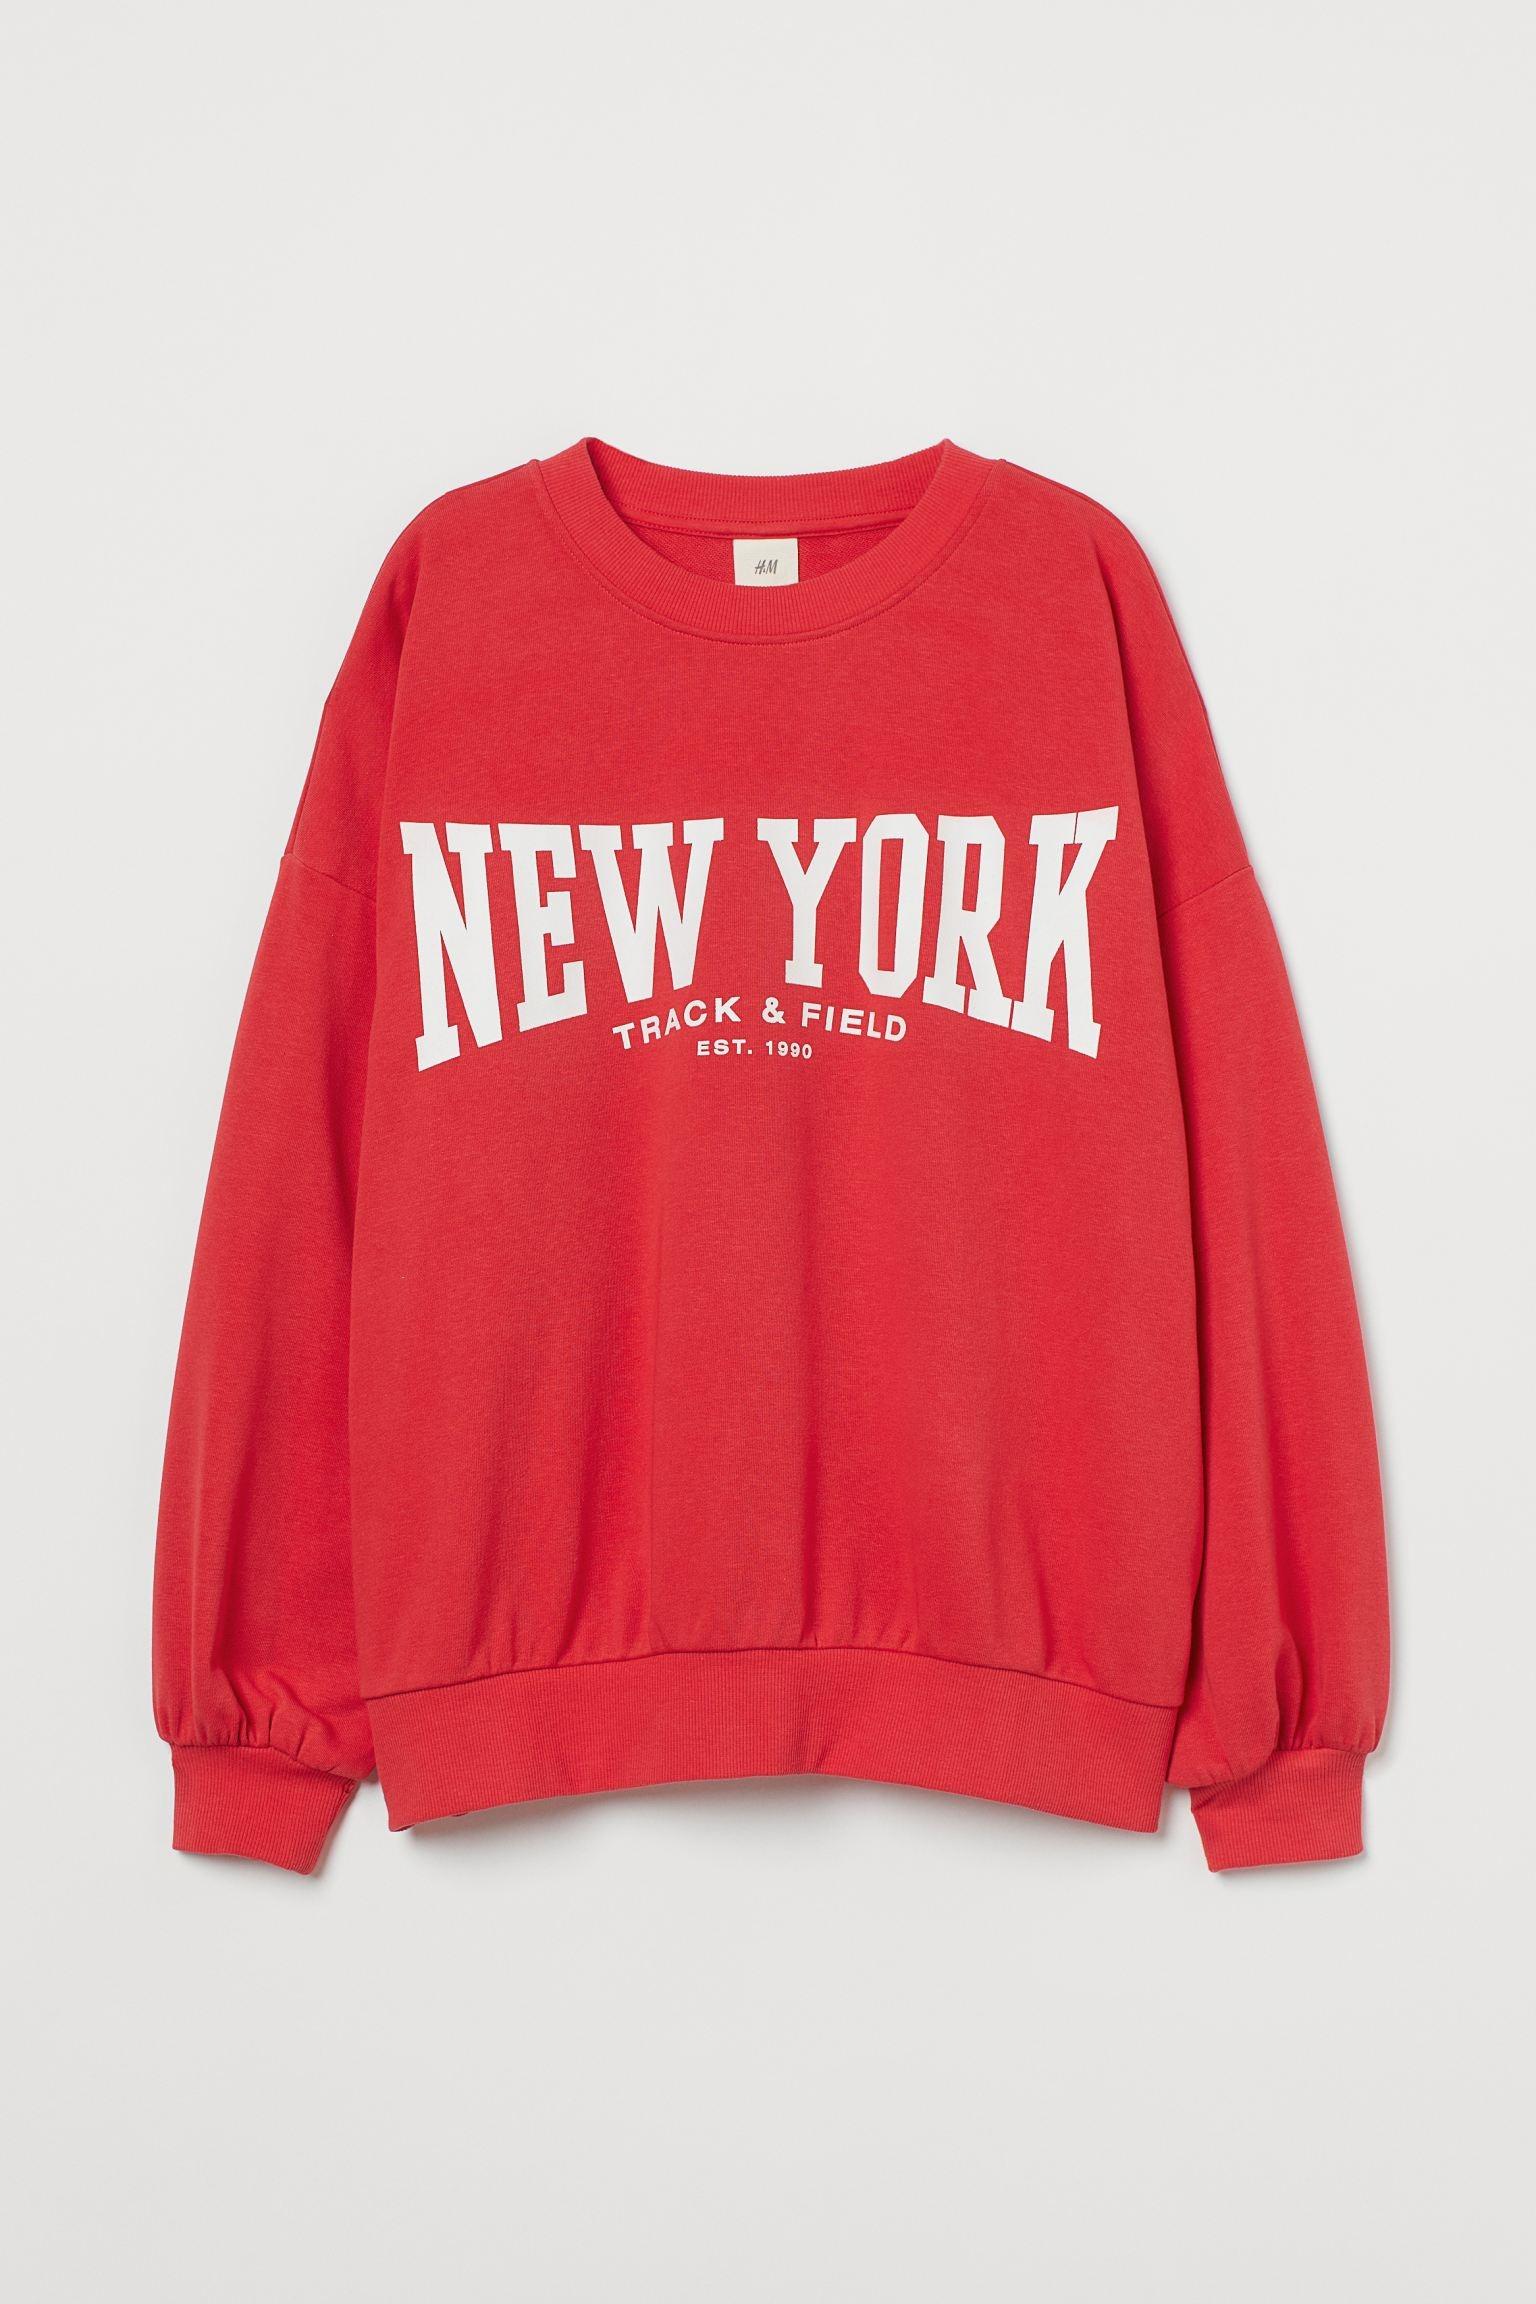 Sudadera en rojo vivo con logo New York de H&M